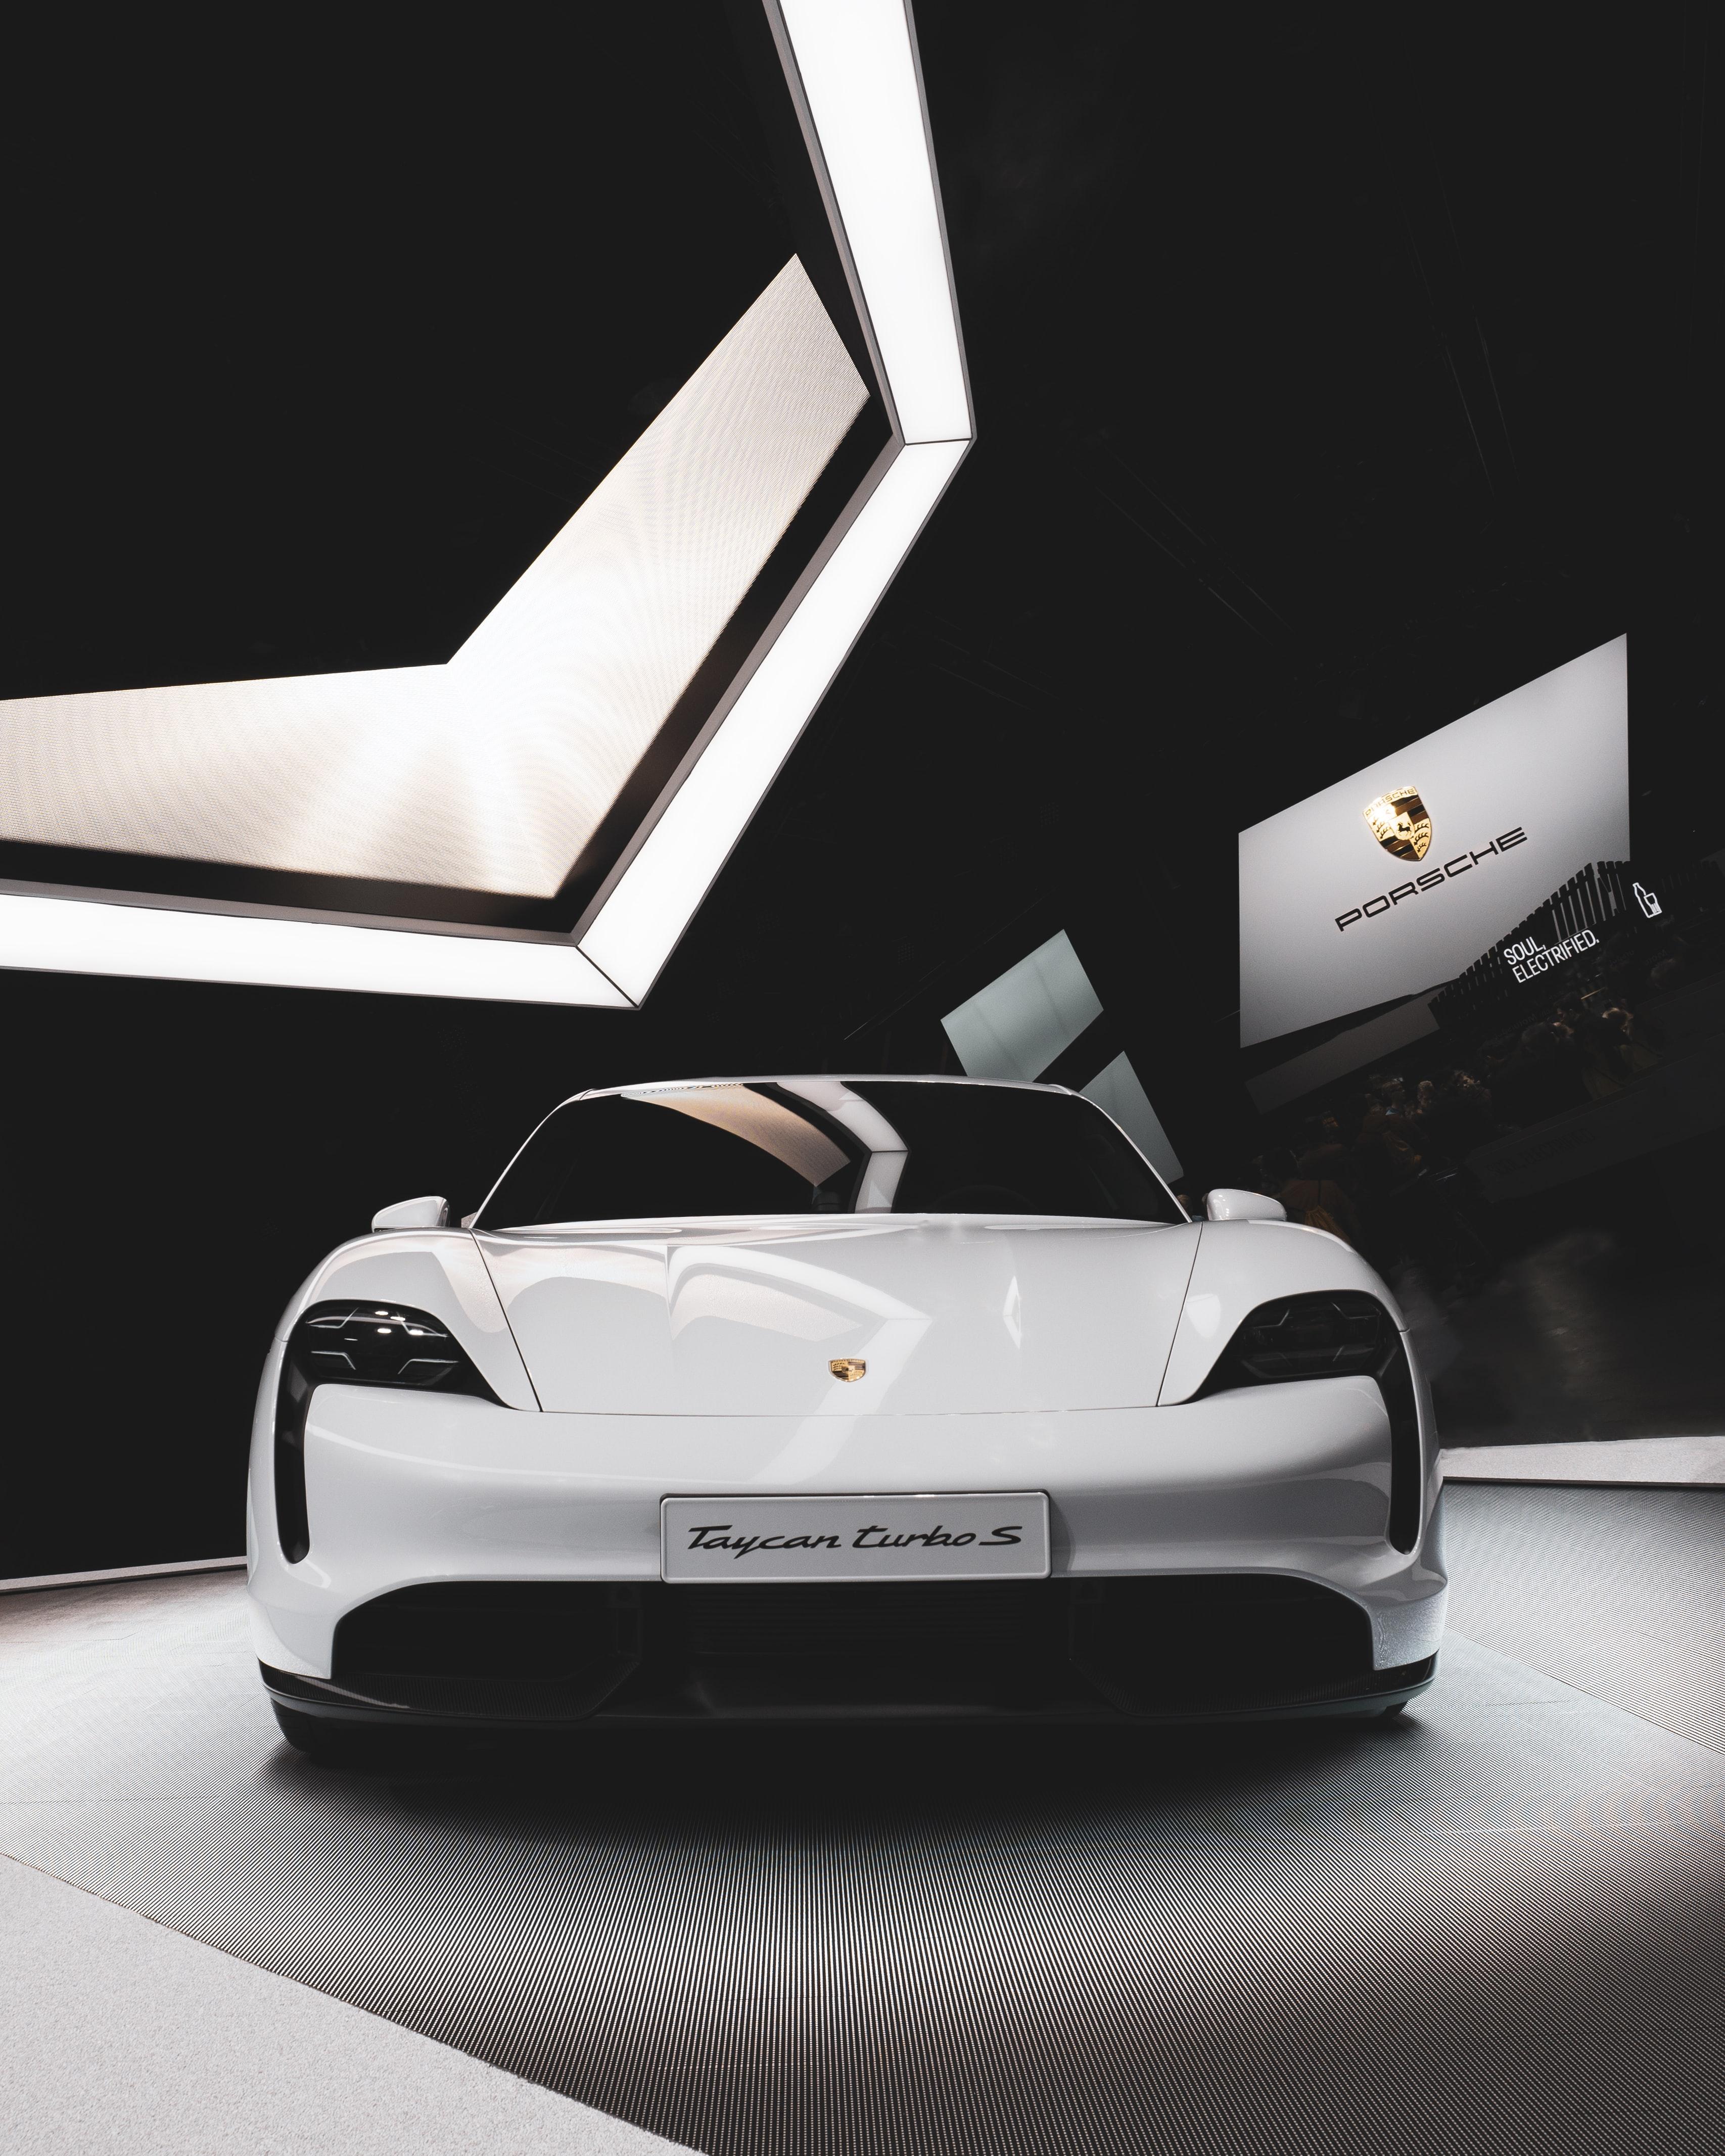 350 Hq Porsche Pictures Download Free Images Stock Photos On Unsplash